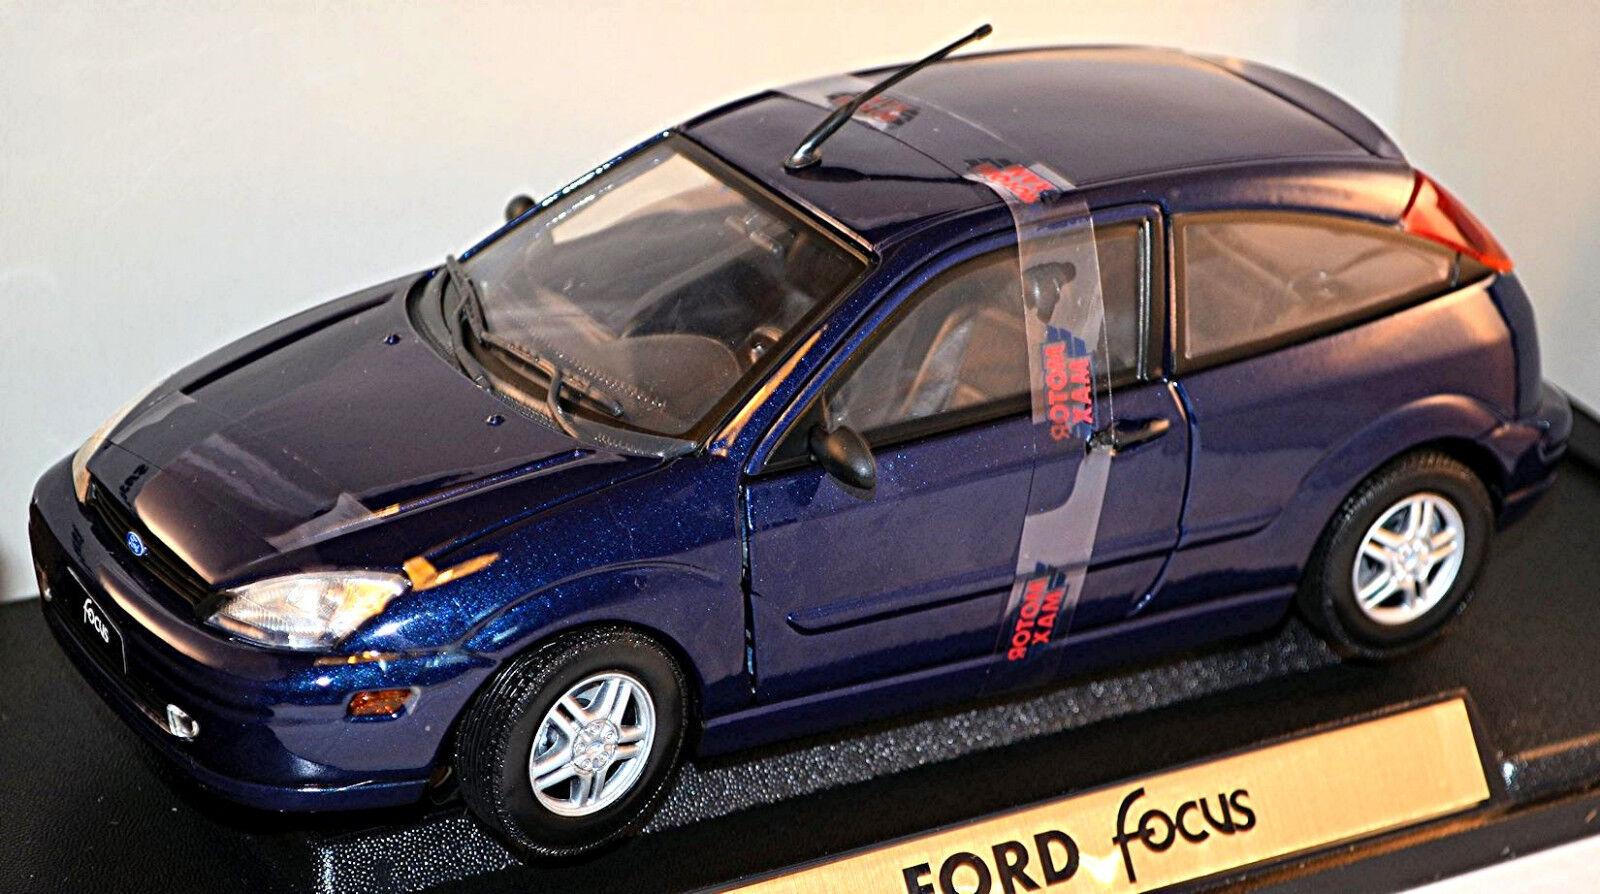 Ford Focus '98 Dreitürer 1998-2001 blau Blau metallic 1 18 Motor Max    König der Quantität